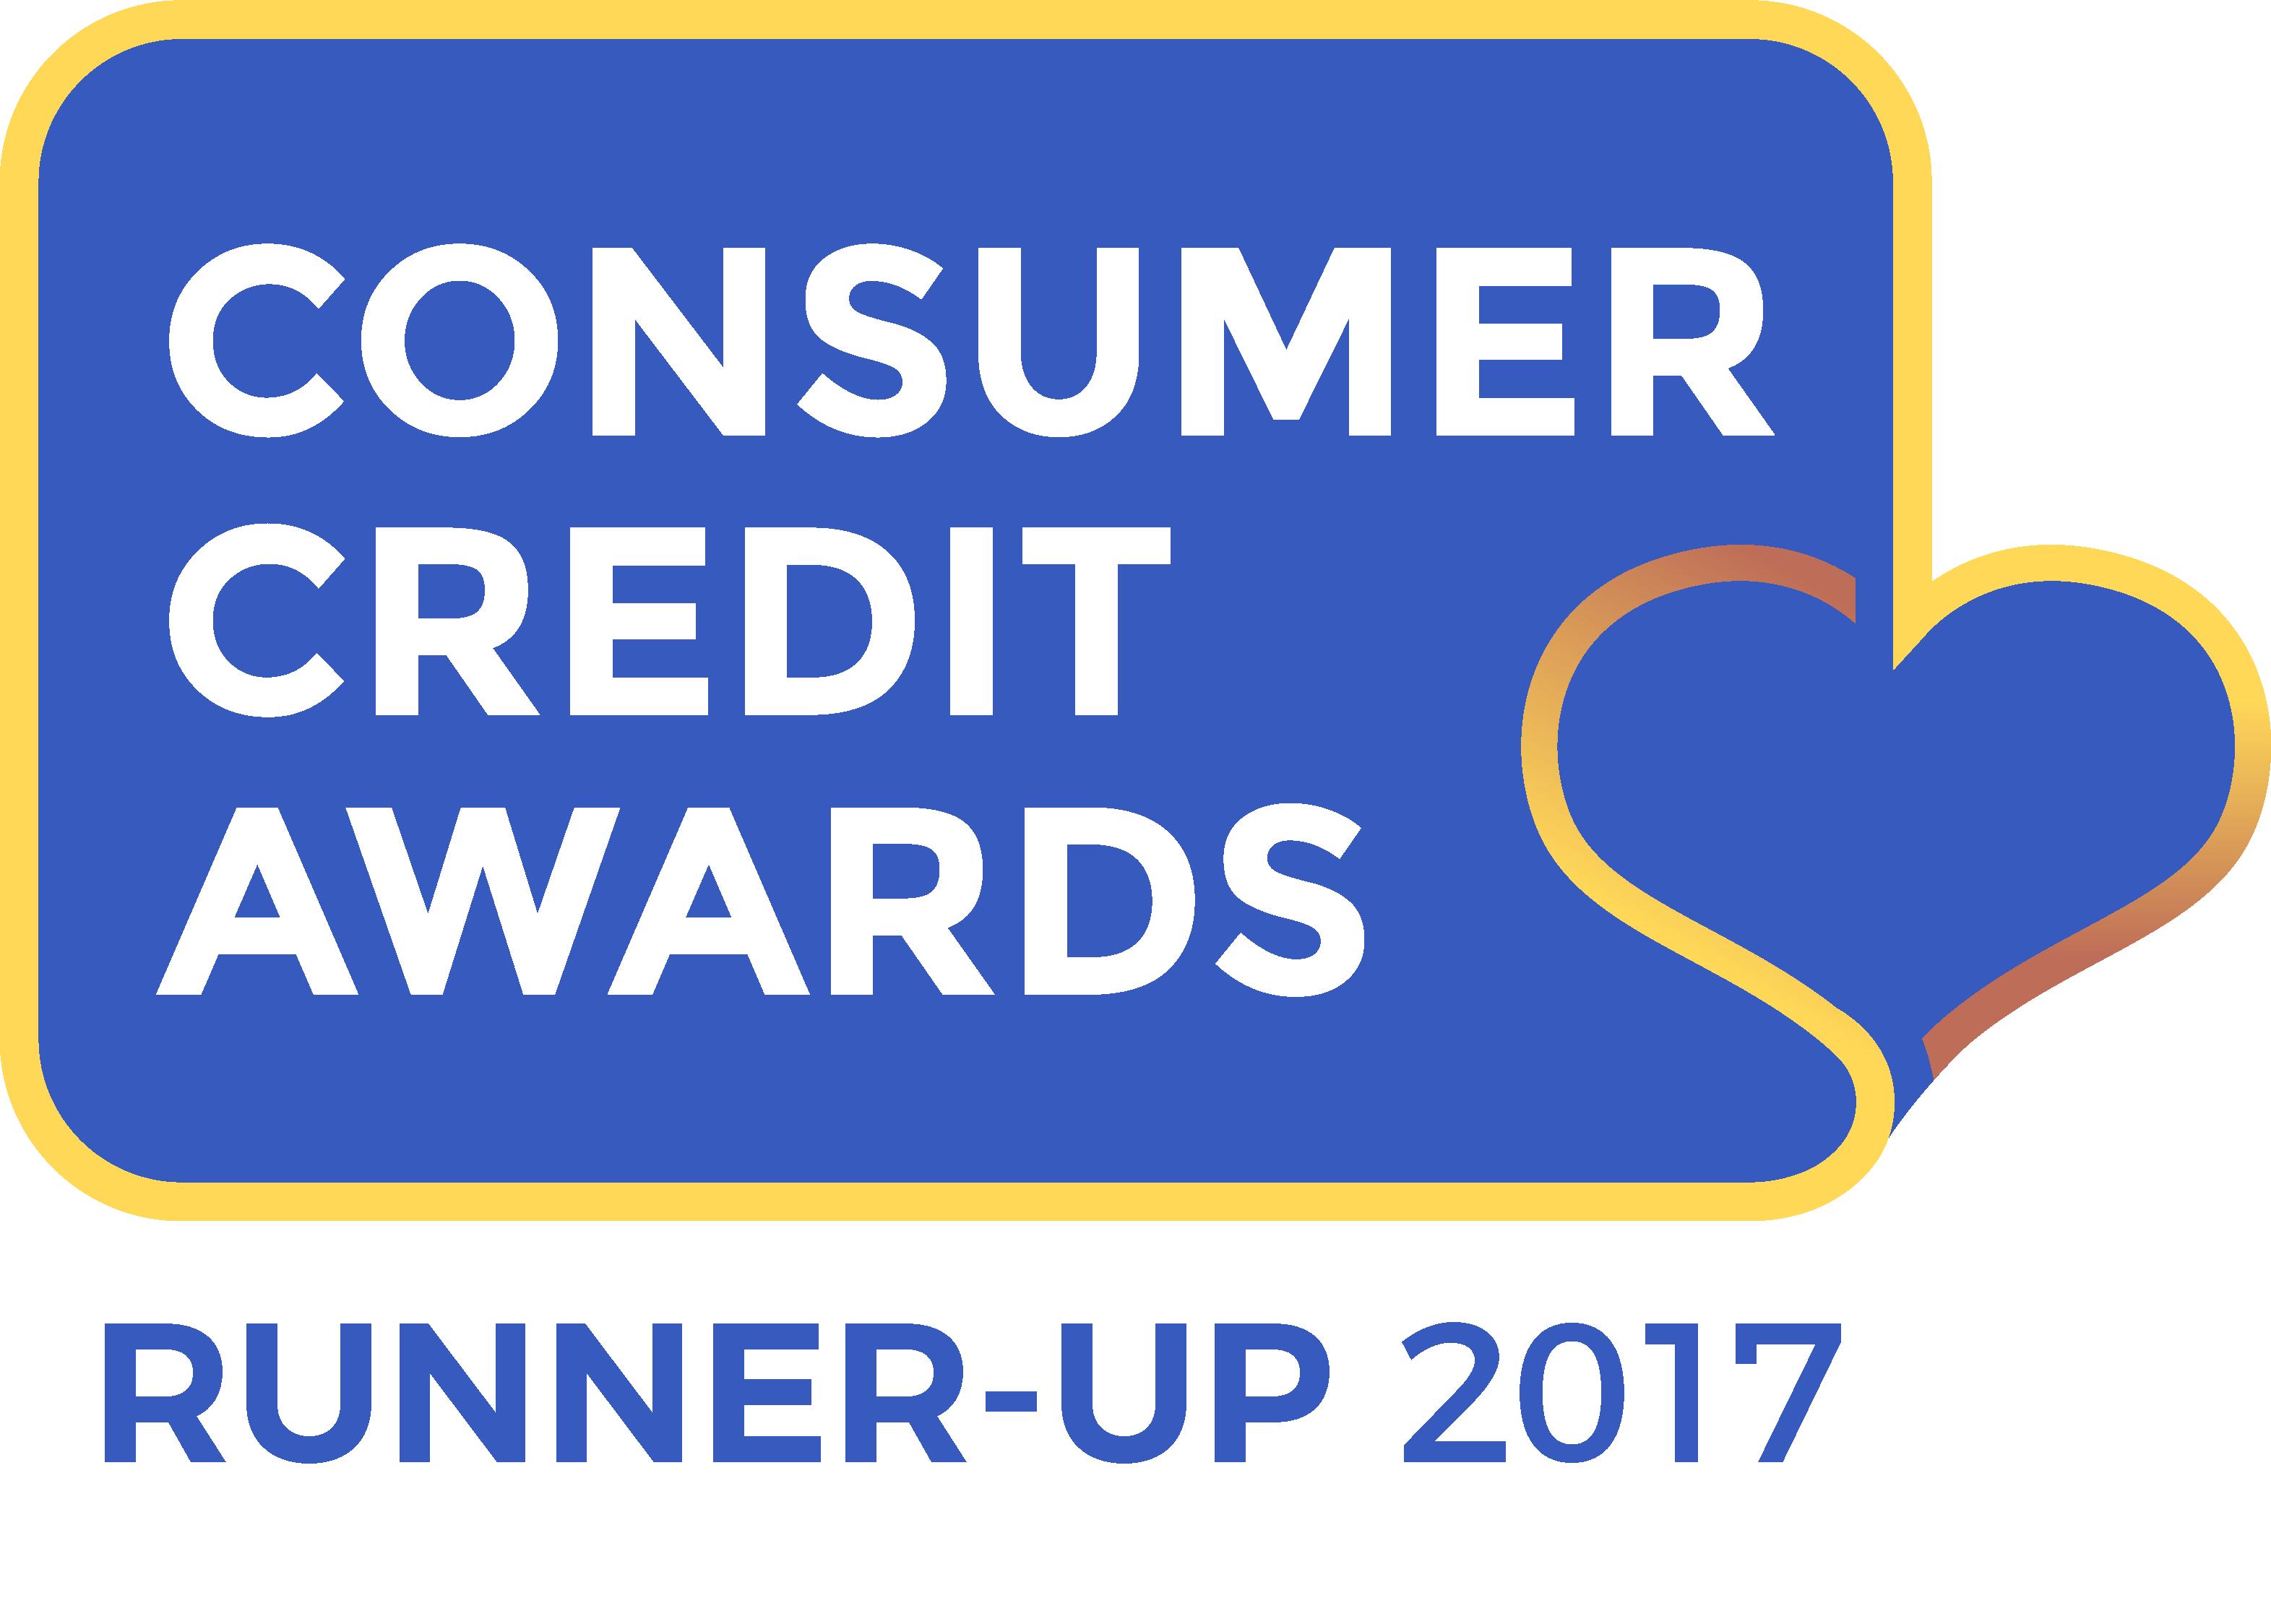 Consumer Credit Awards